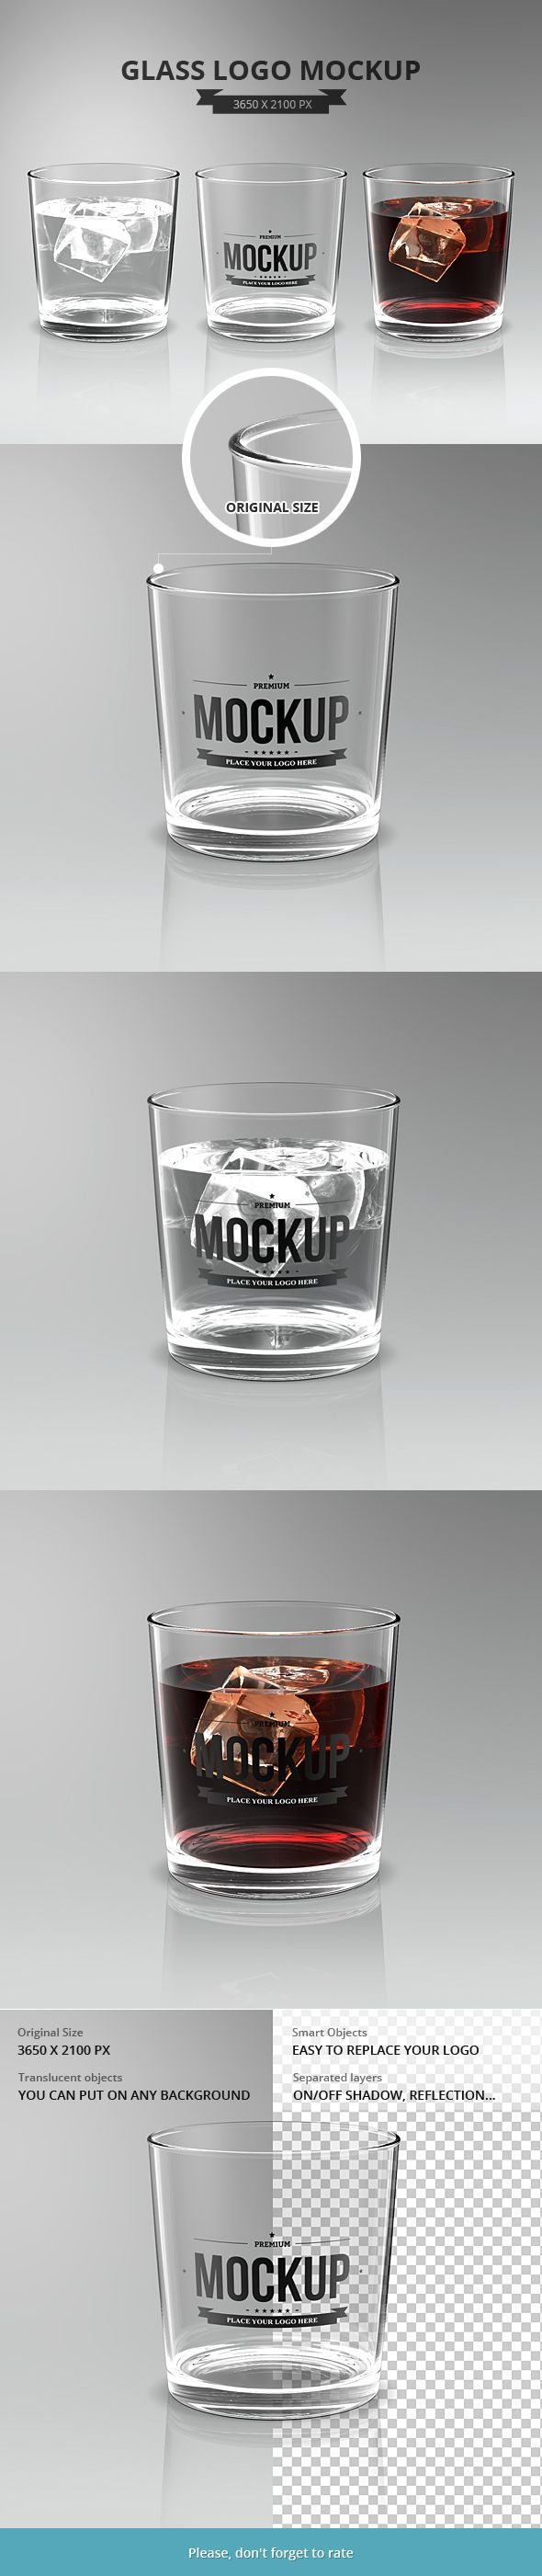 Glasses Logo Mockup. Alcohol, ayashi, champagne, clear